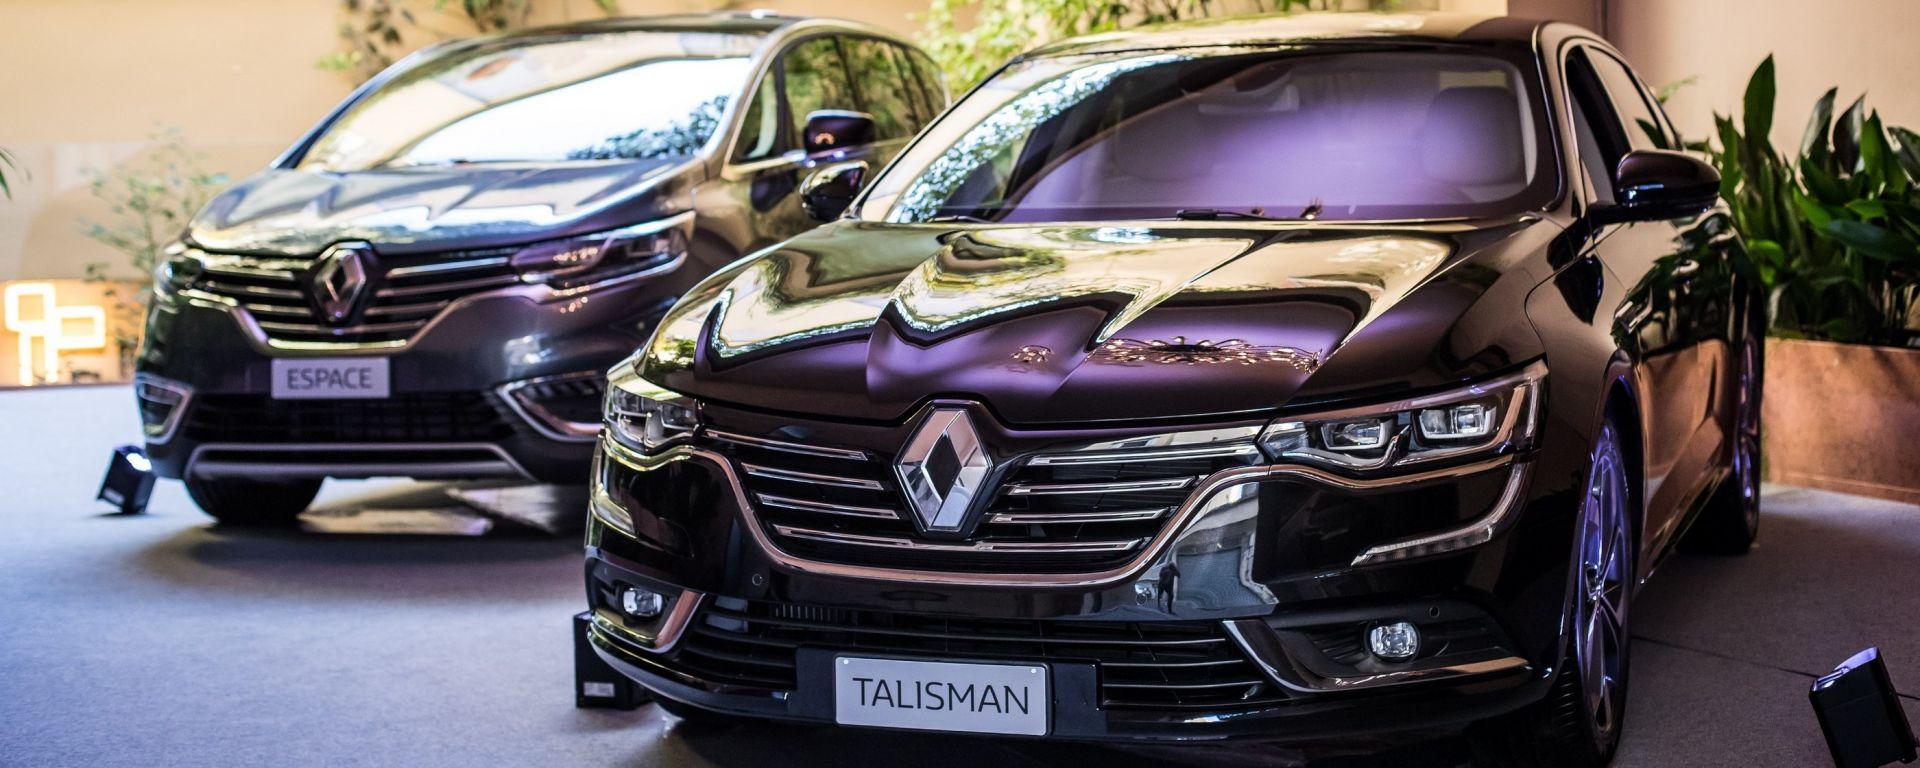 Renault lancia la gamma Executive su Talisman e Espace